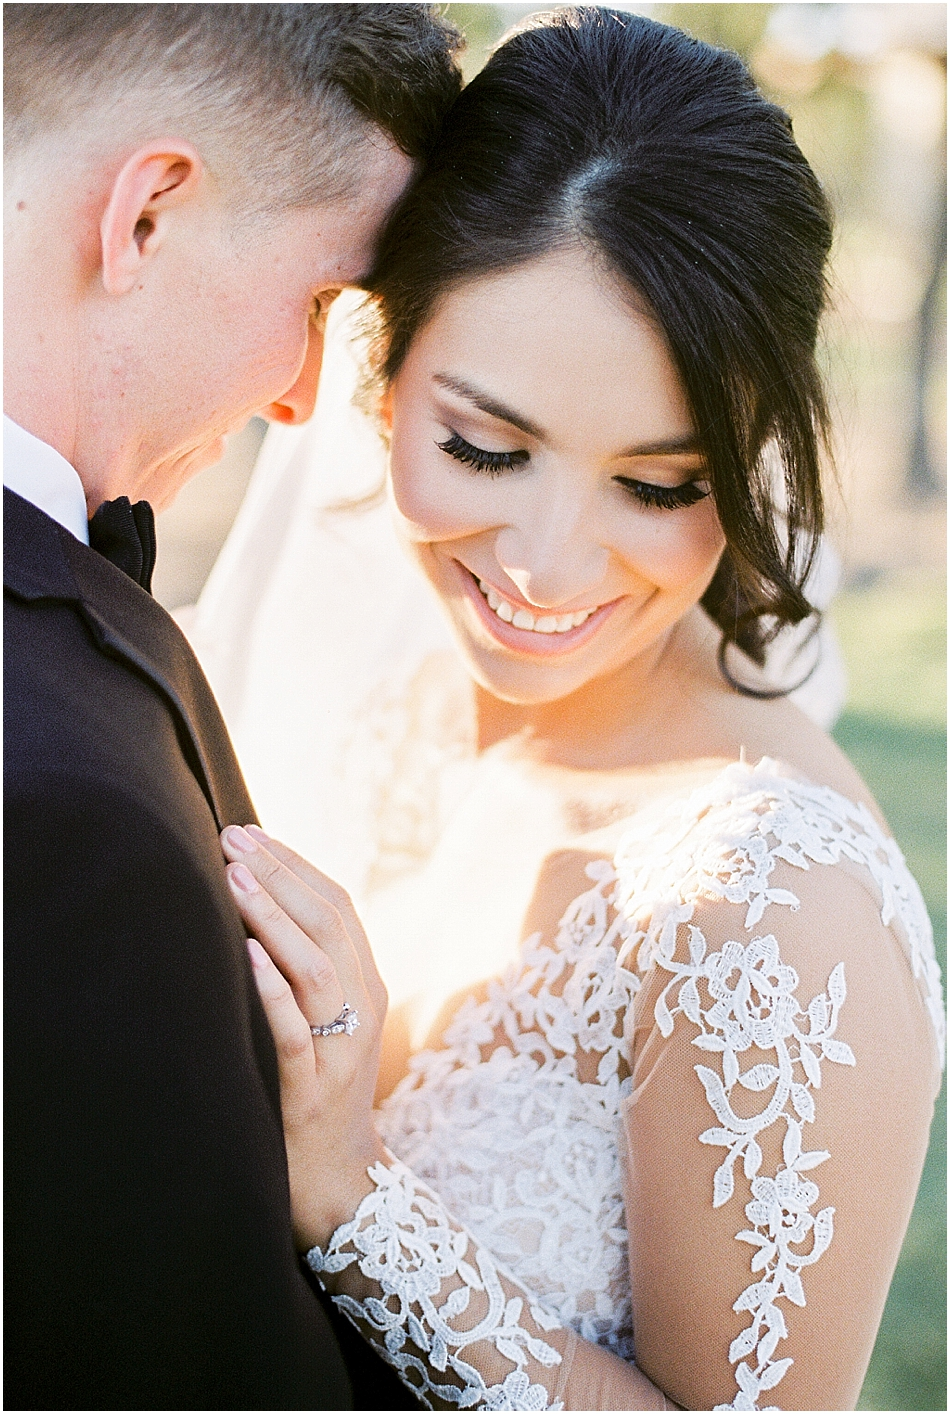 Adrianna + Preston   Film   Wedding   Canyonwood Ridge   Texas Hill Country   Emilie Anne Photography-73.jpg